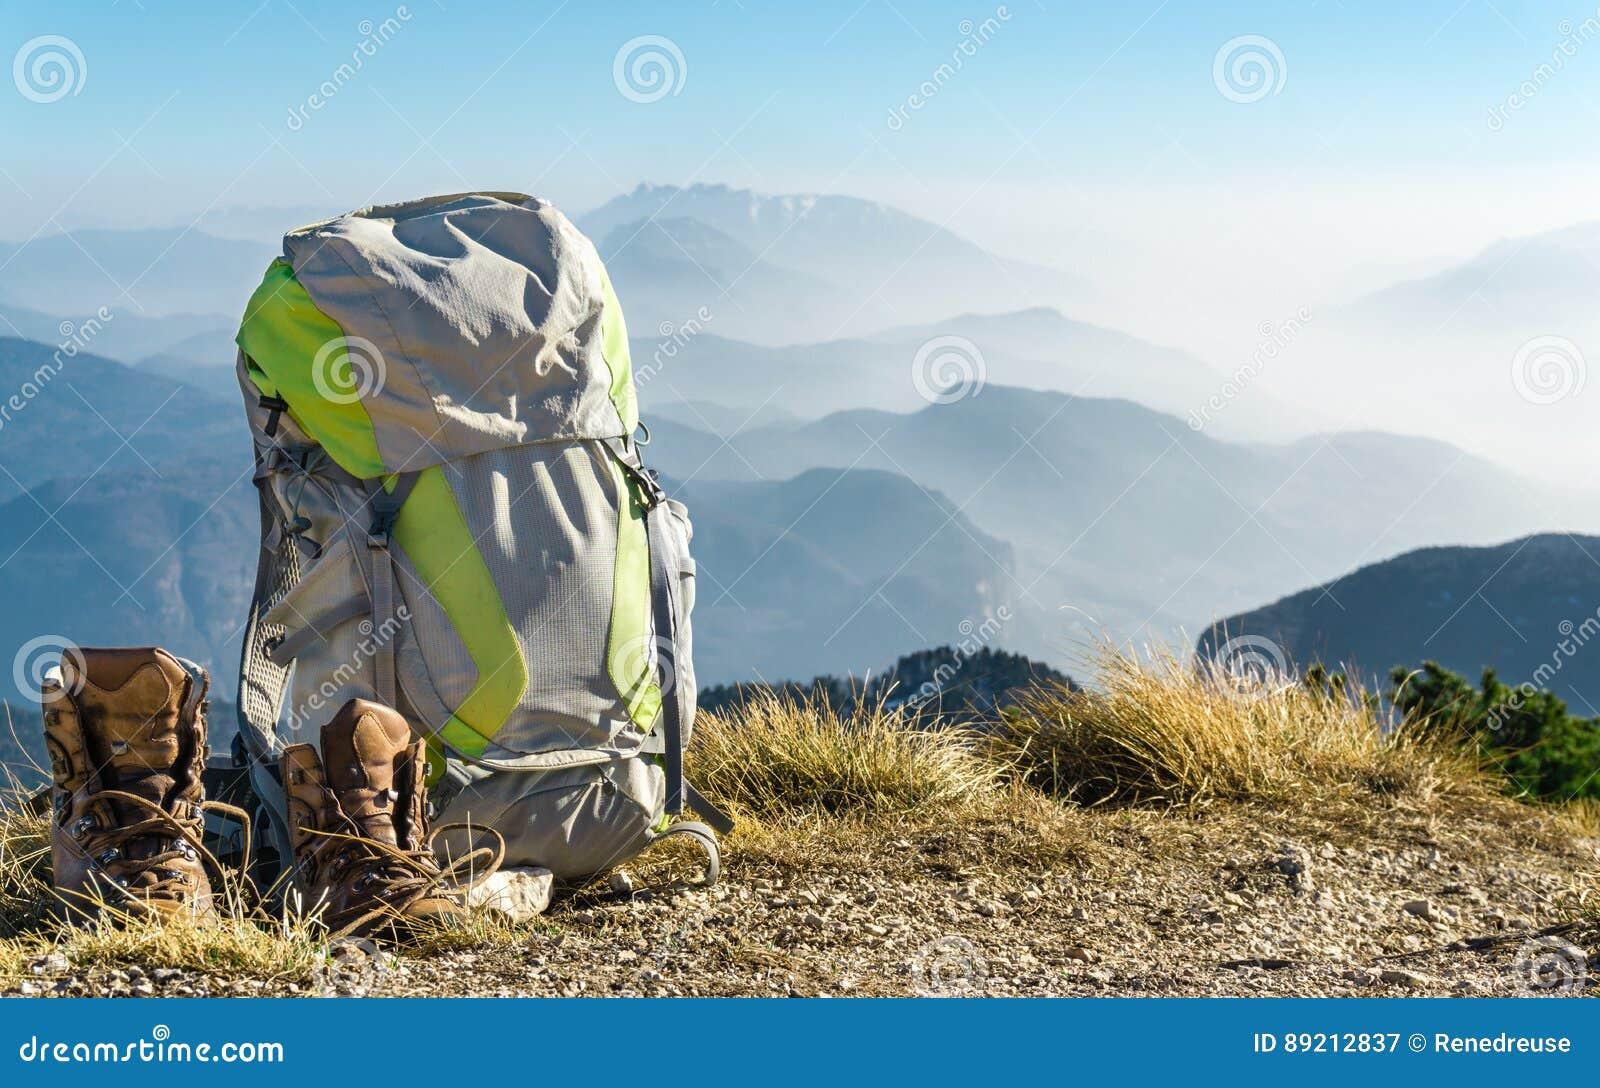 7fda73c6c5 πεζοπορία εξοπλισμού Σακίδιο πλάτης και μπότες πάνω από το βουνό ...